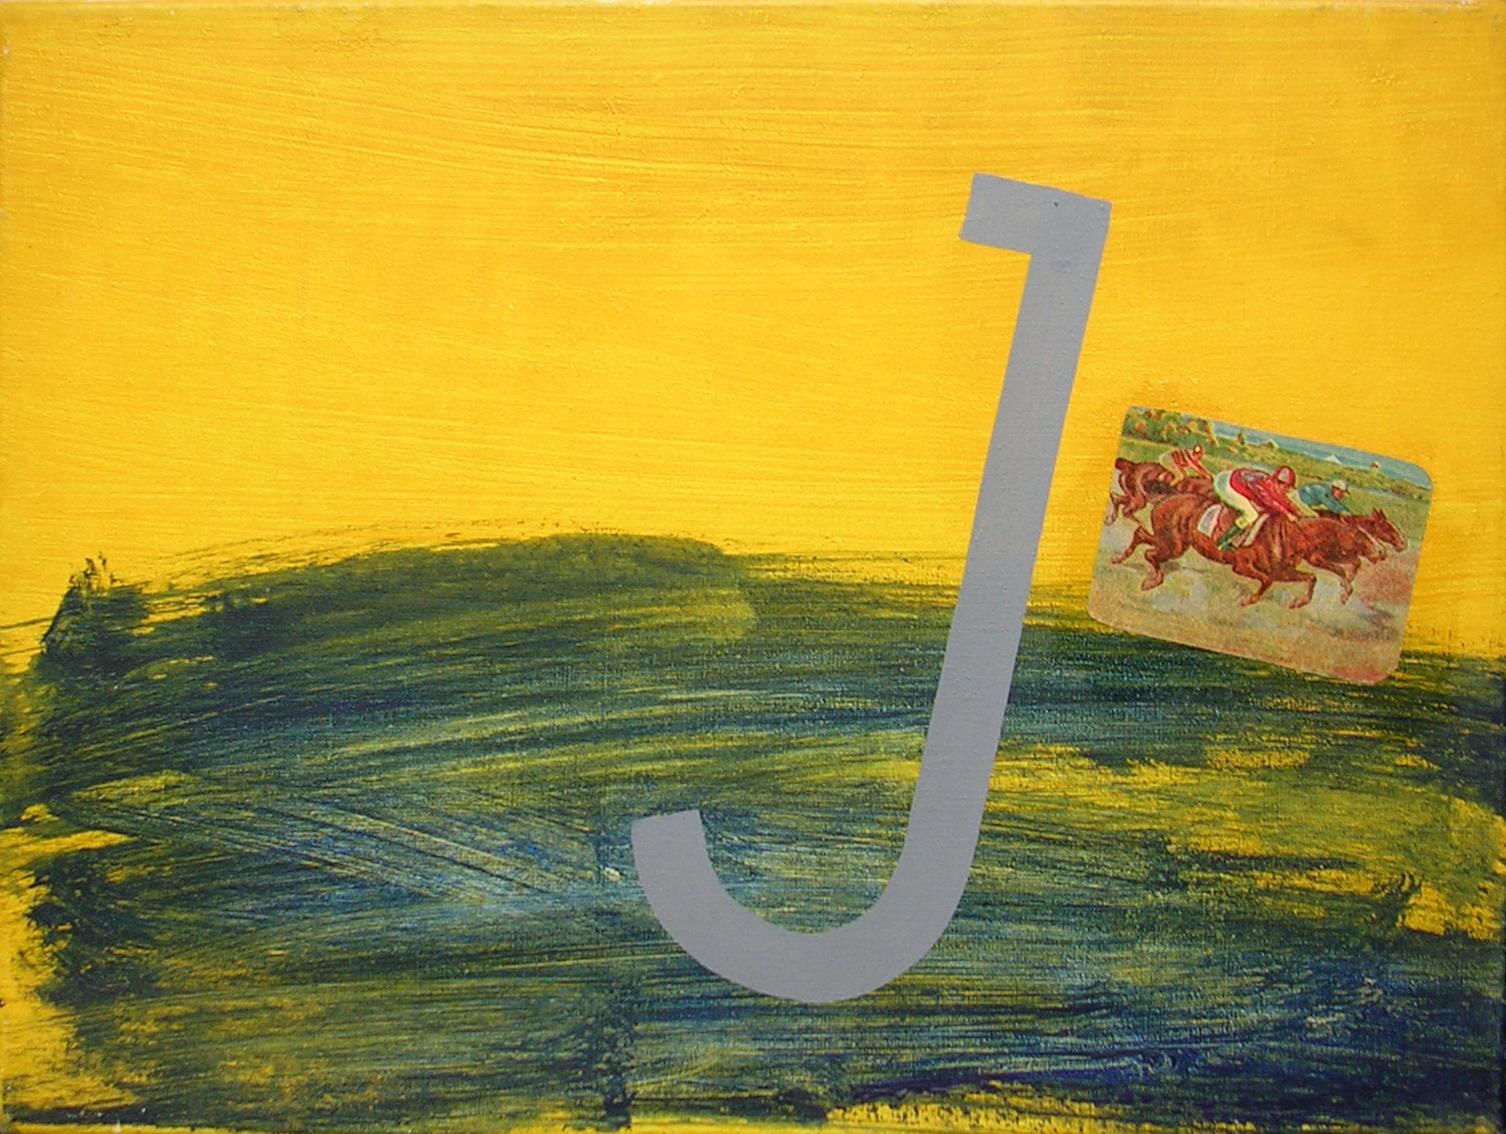 Abecedario  J; objetos ensamblados, tela, papel sobre bastidor, 30 cm x 40 cm, 2007